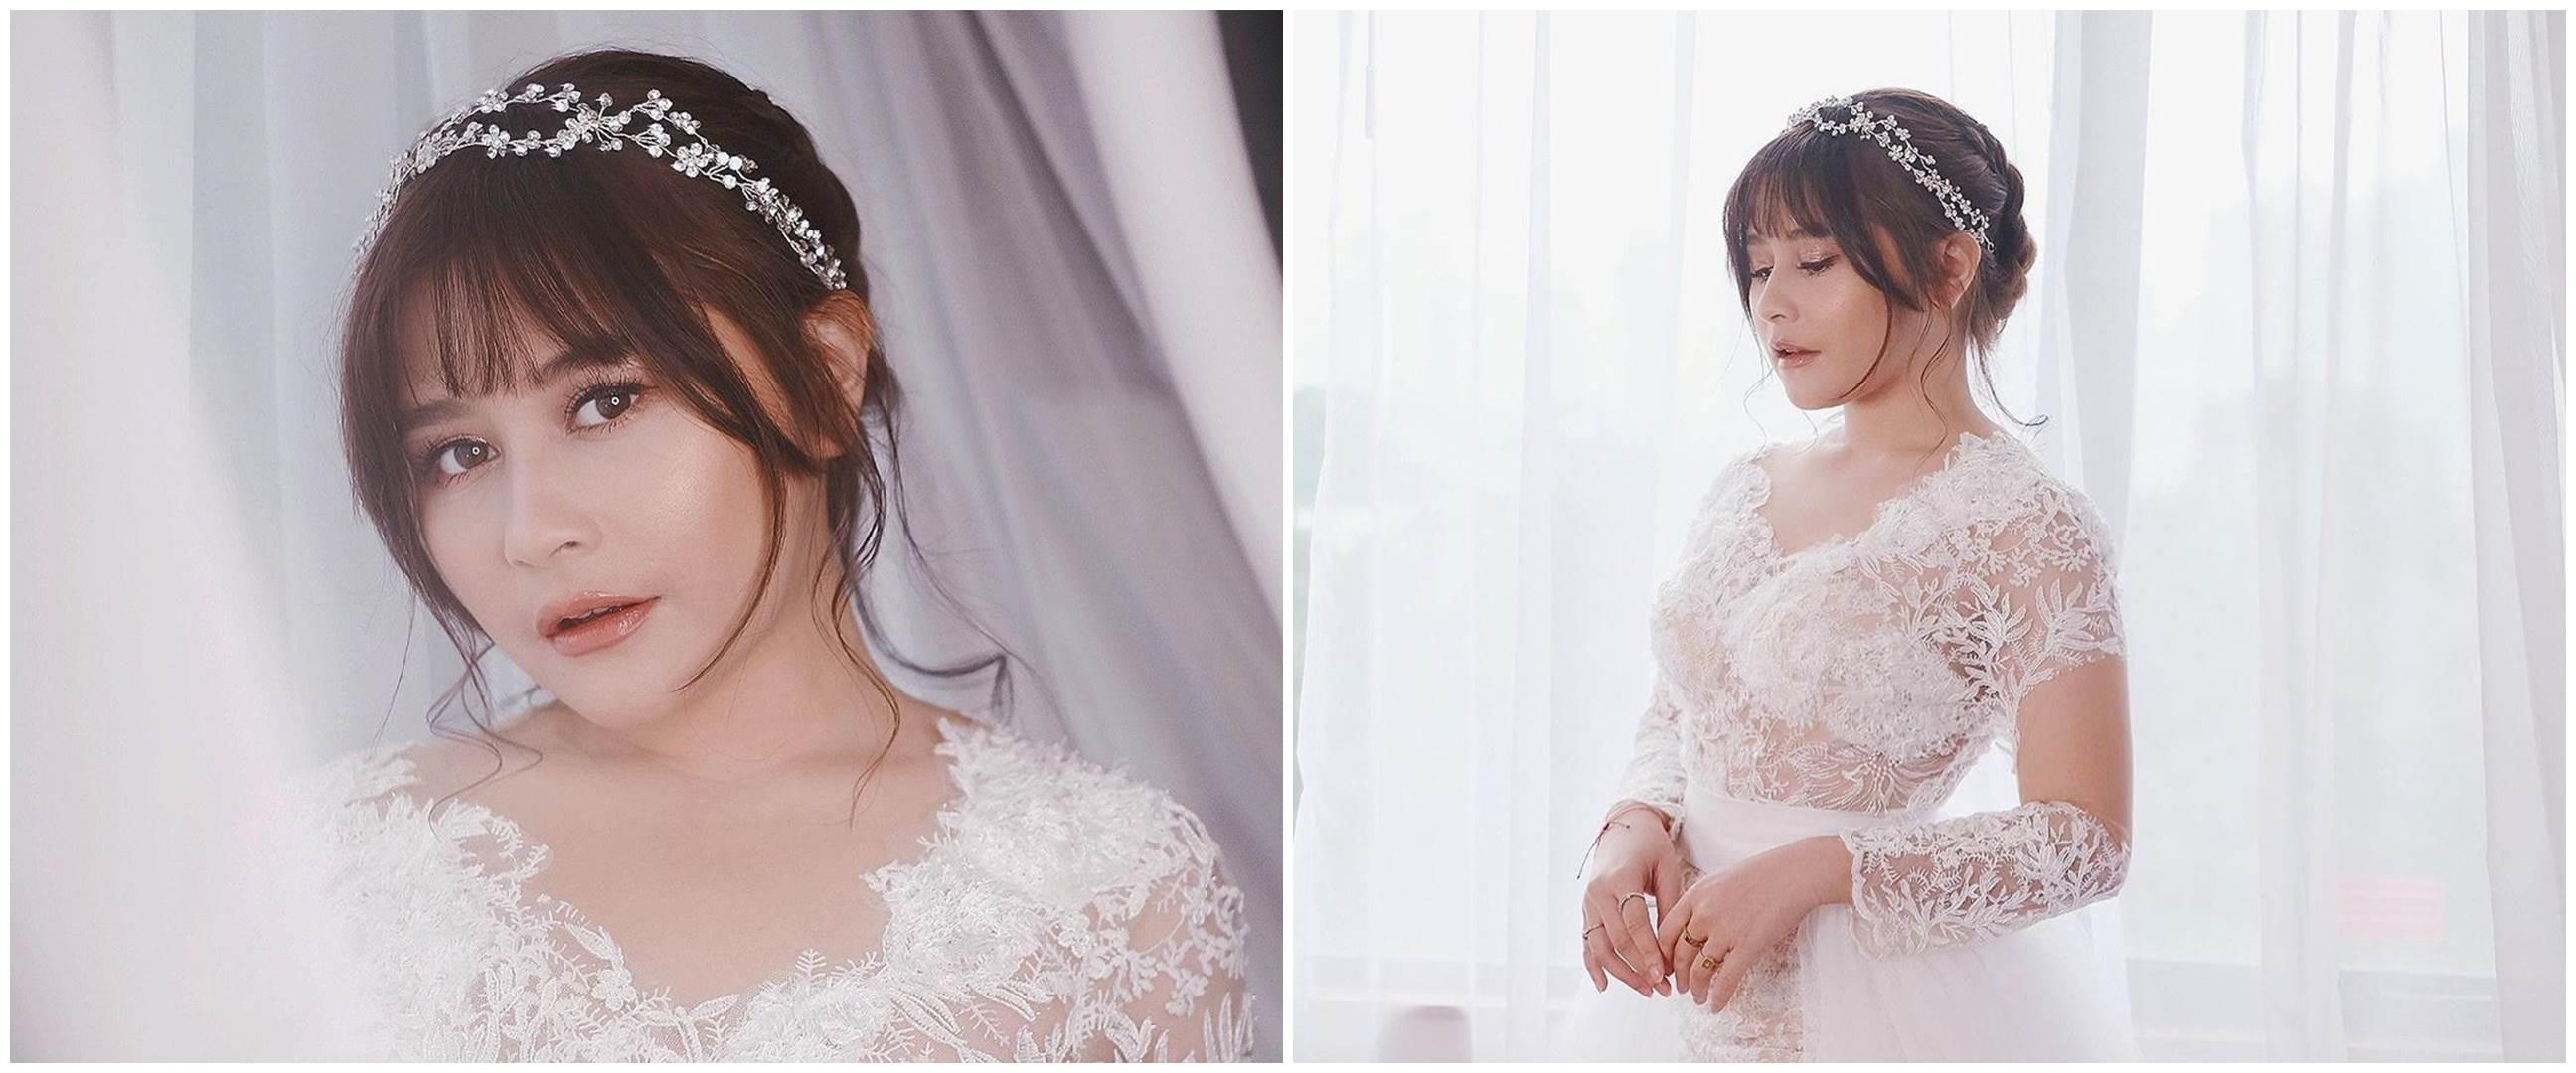 7 Potret Prilly Latuconsina pakai baju pengantin, tuai banyak pujian